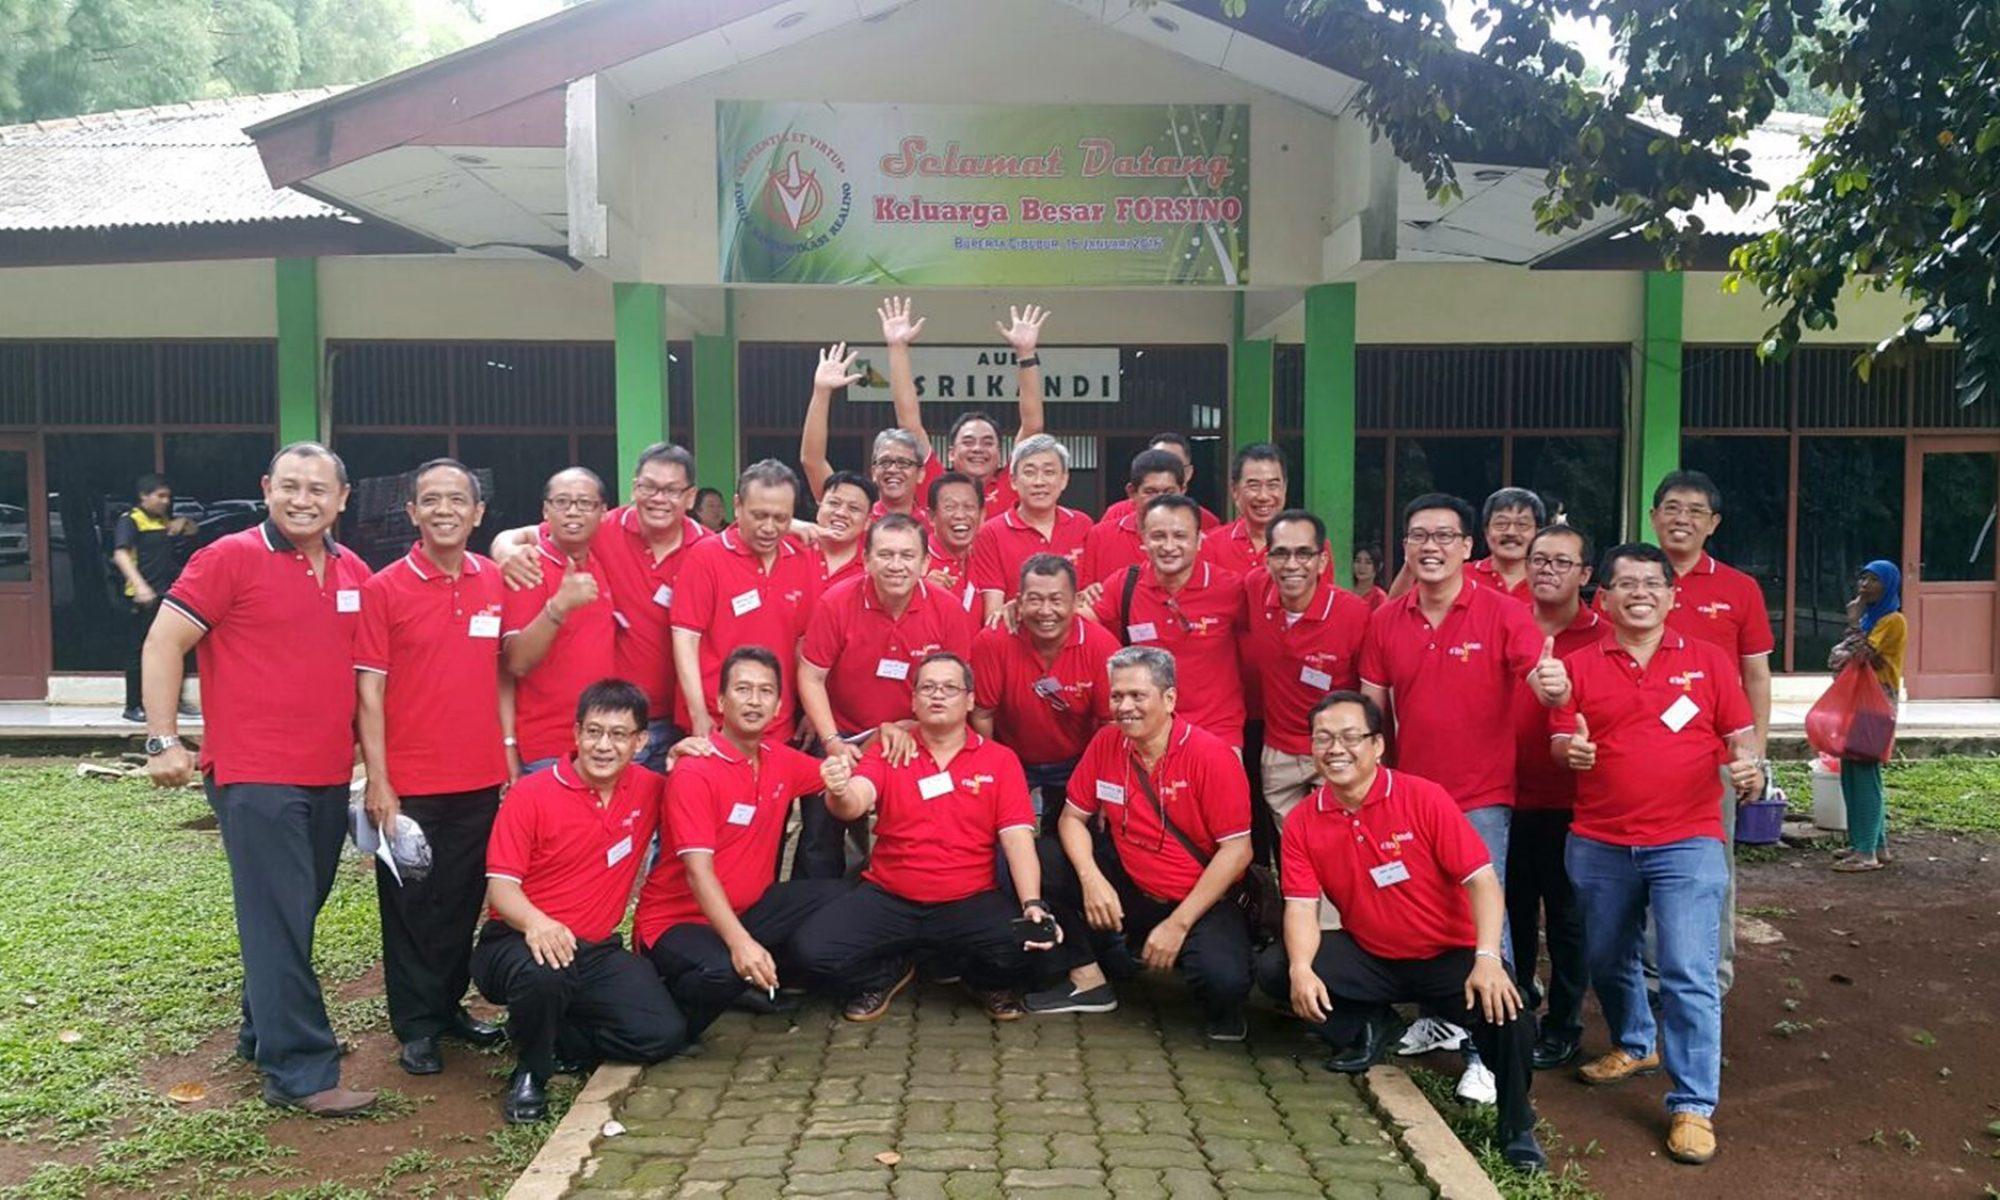 Forsino Nusantara